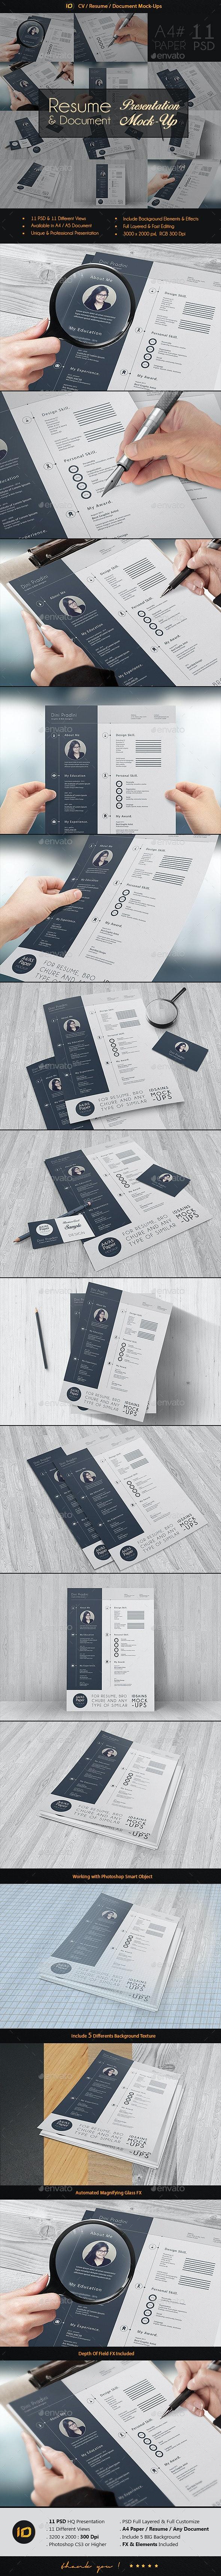 CV / Resume Mock-Up - Print Product Mock-Ups